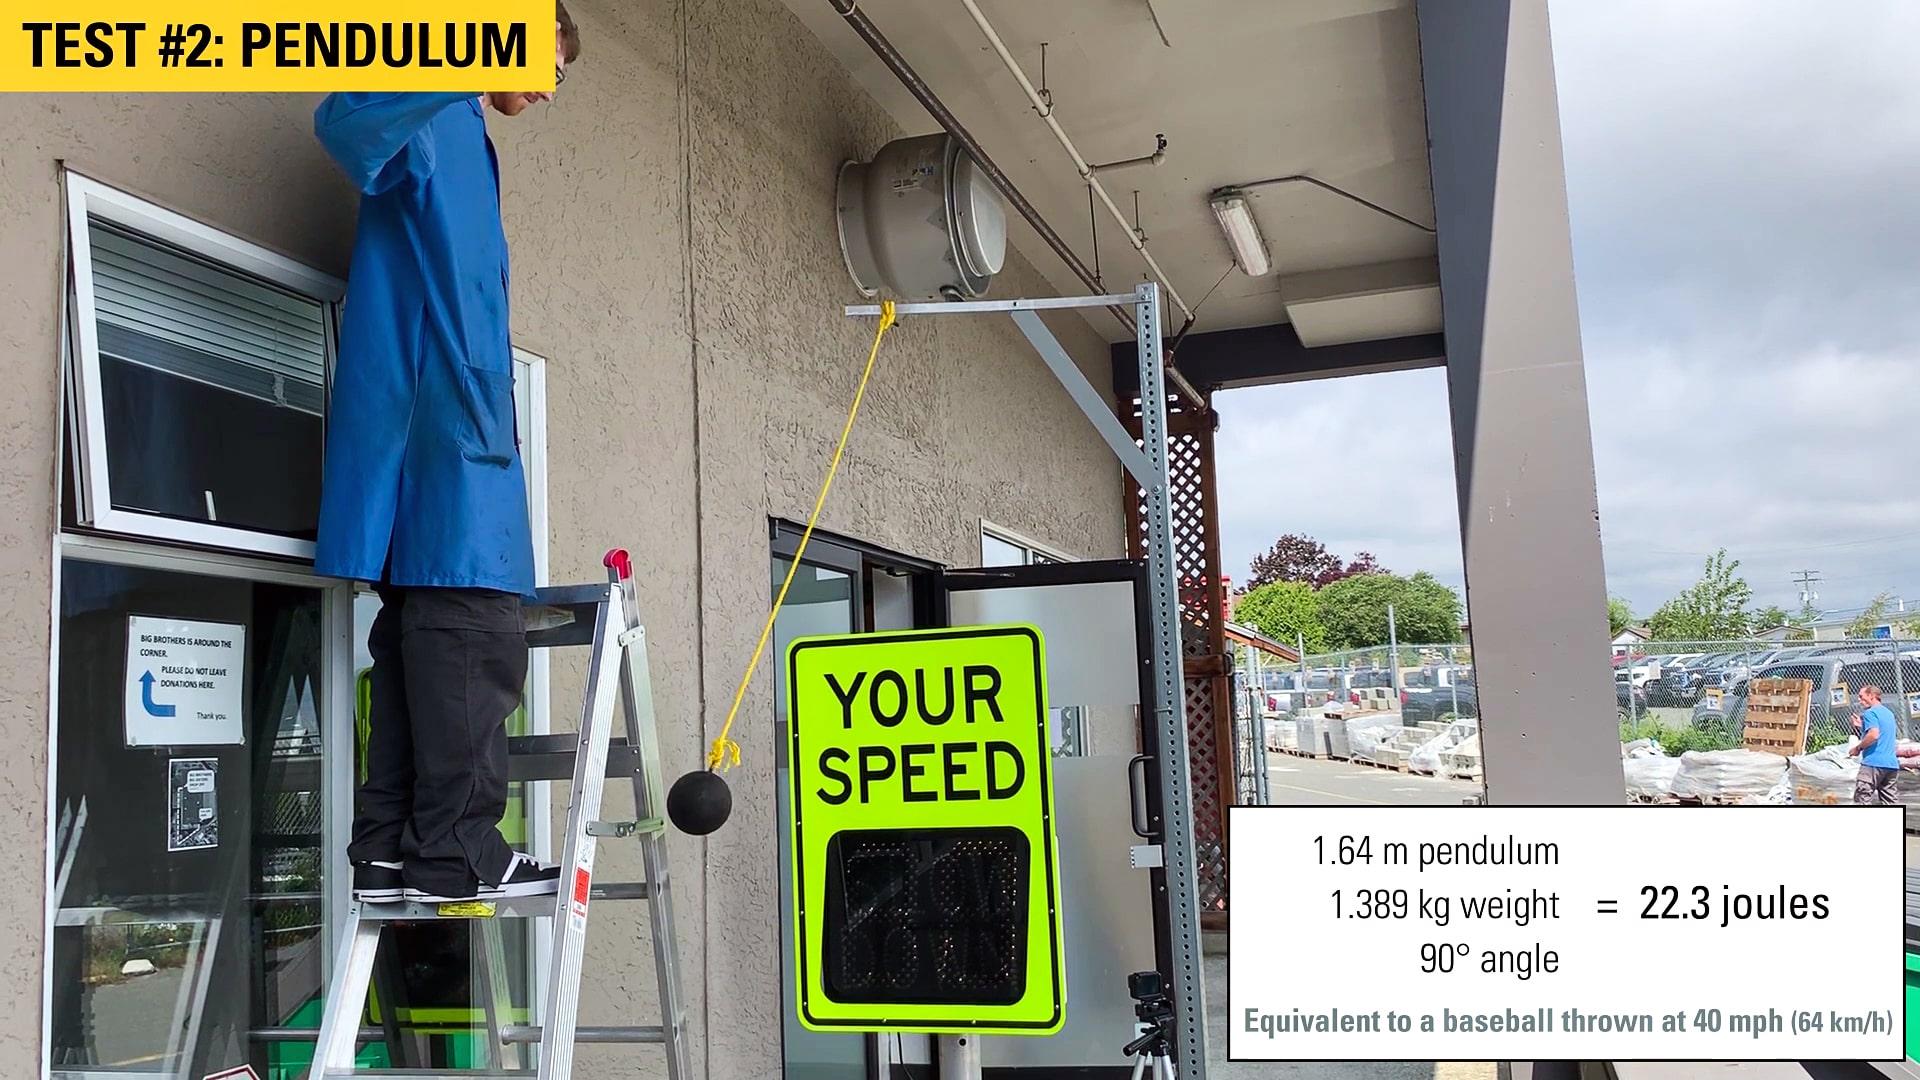 speedcheck radar speed sign pendulum test